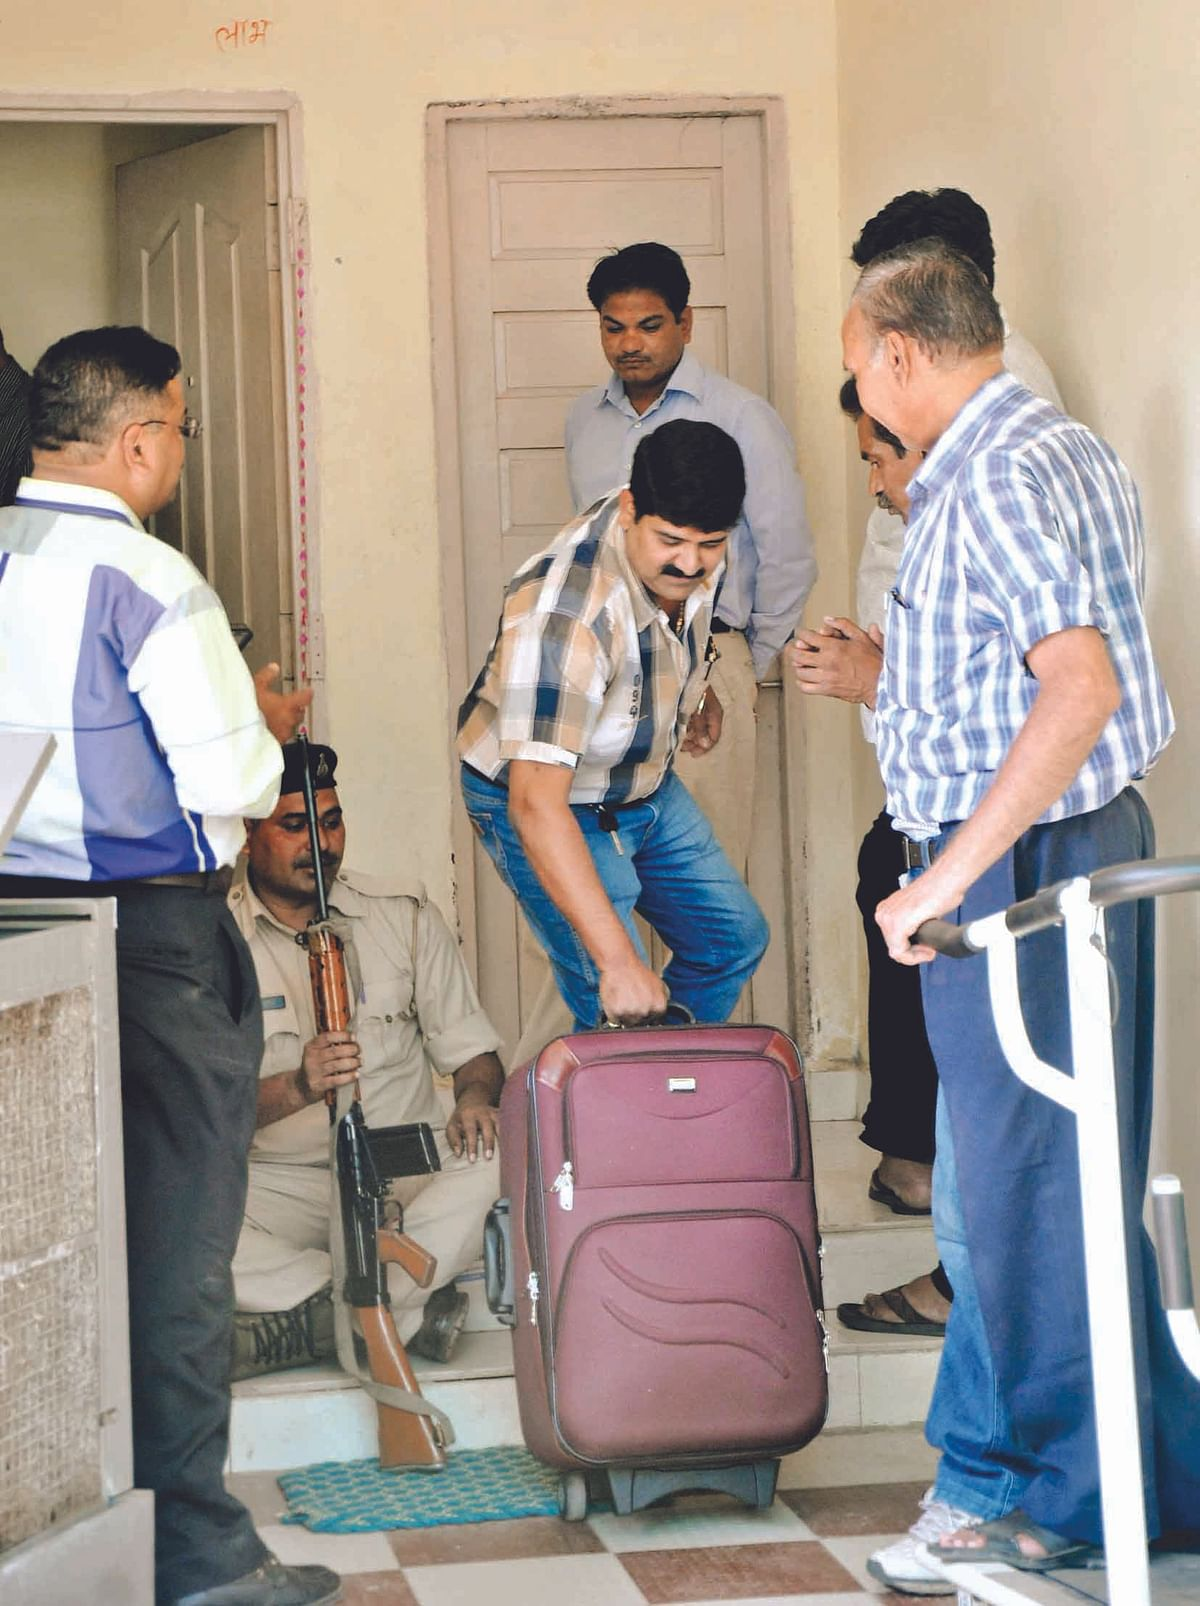 Gupta too got complaints against Jain